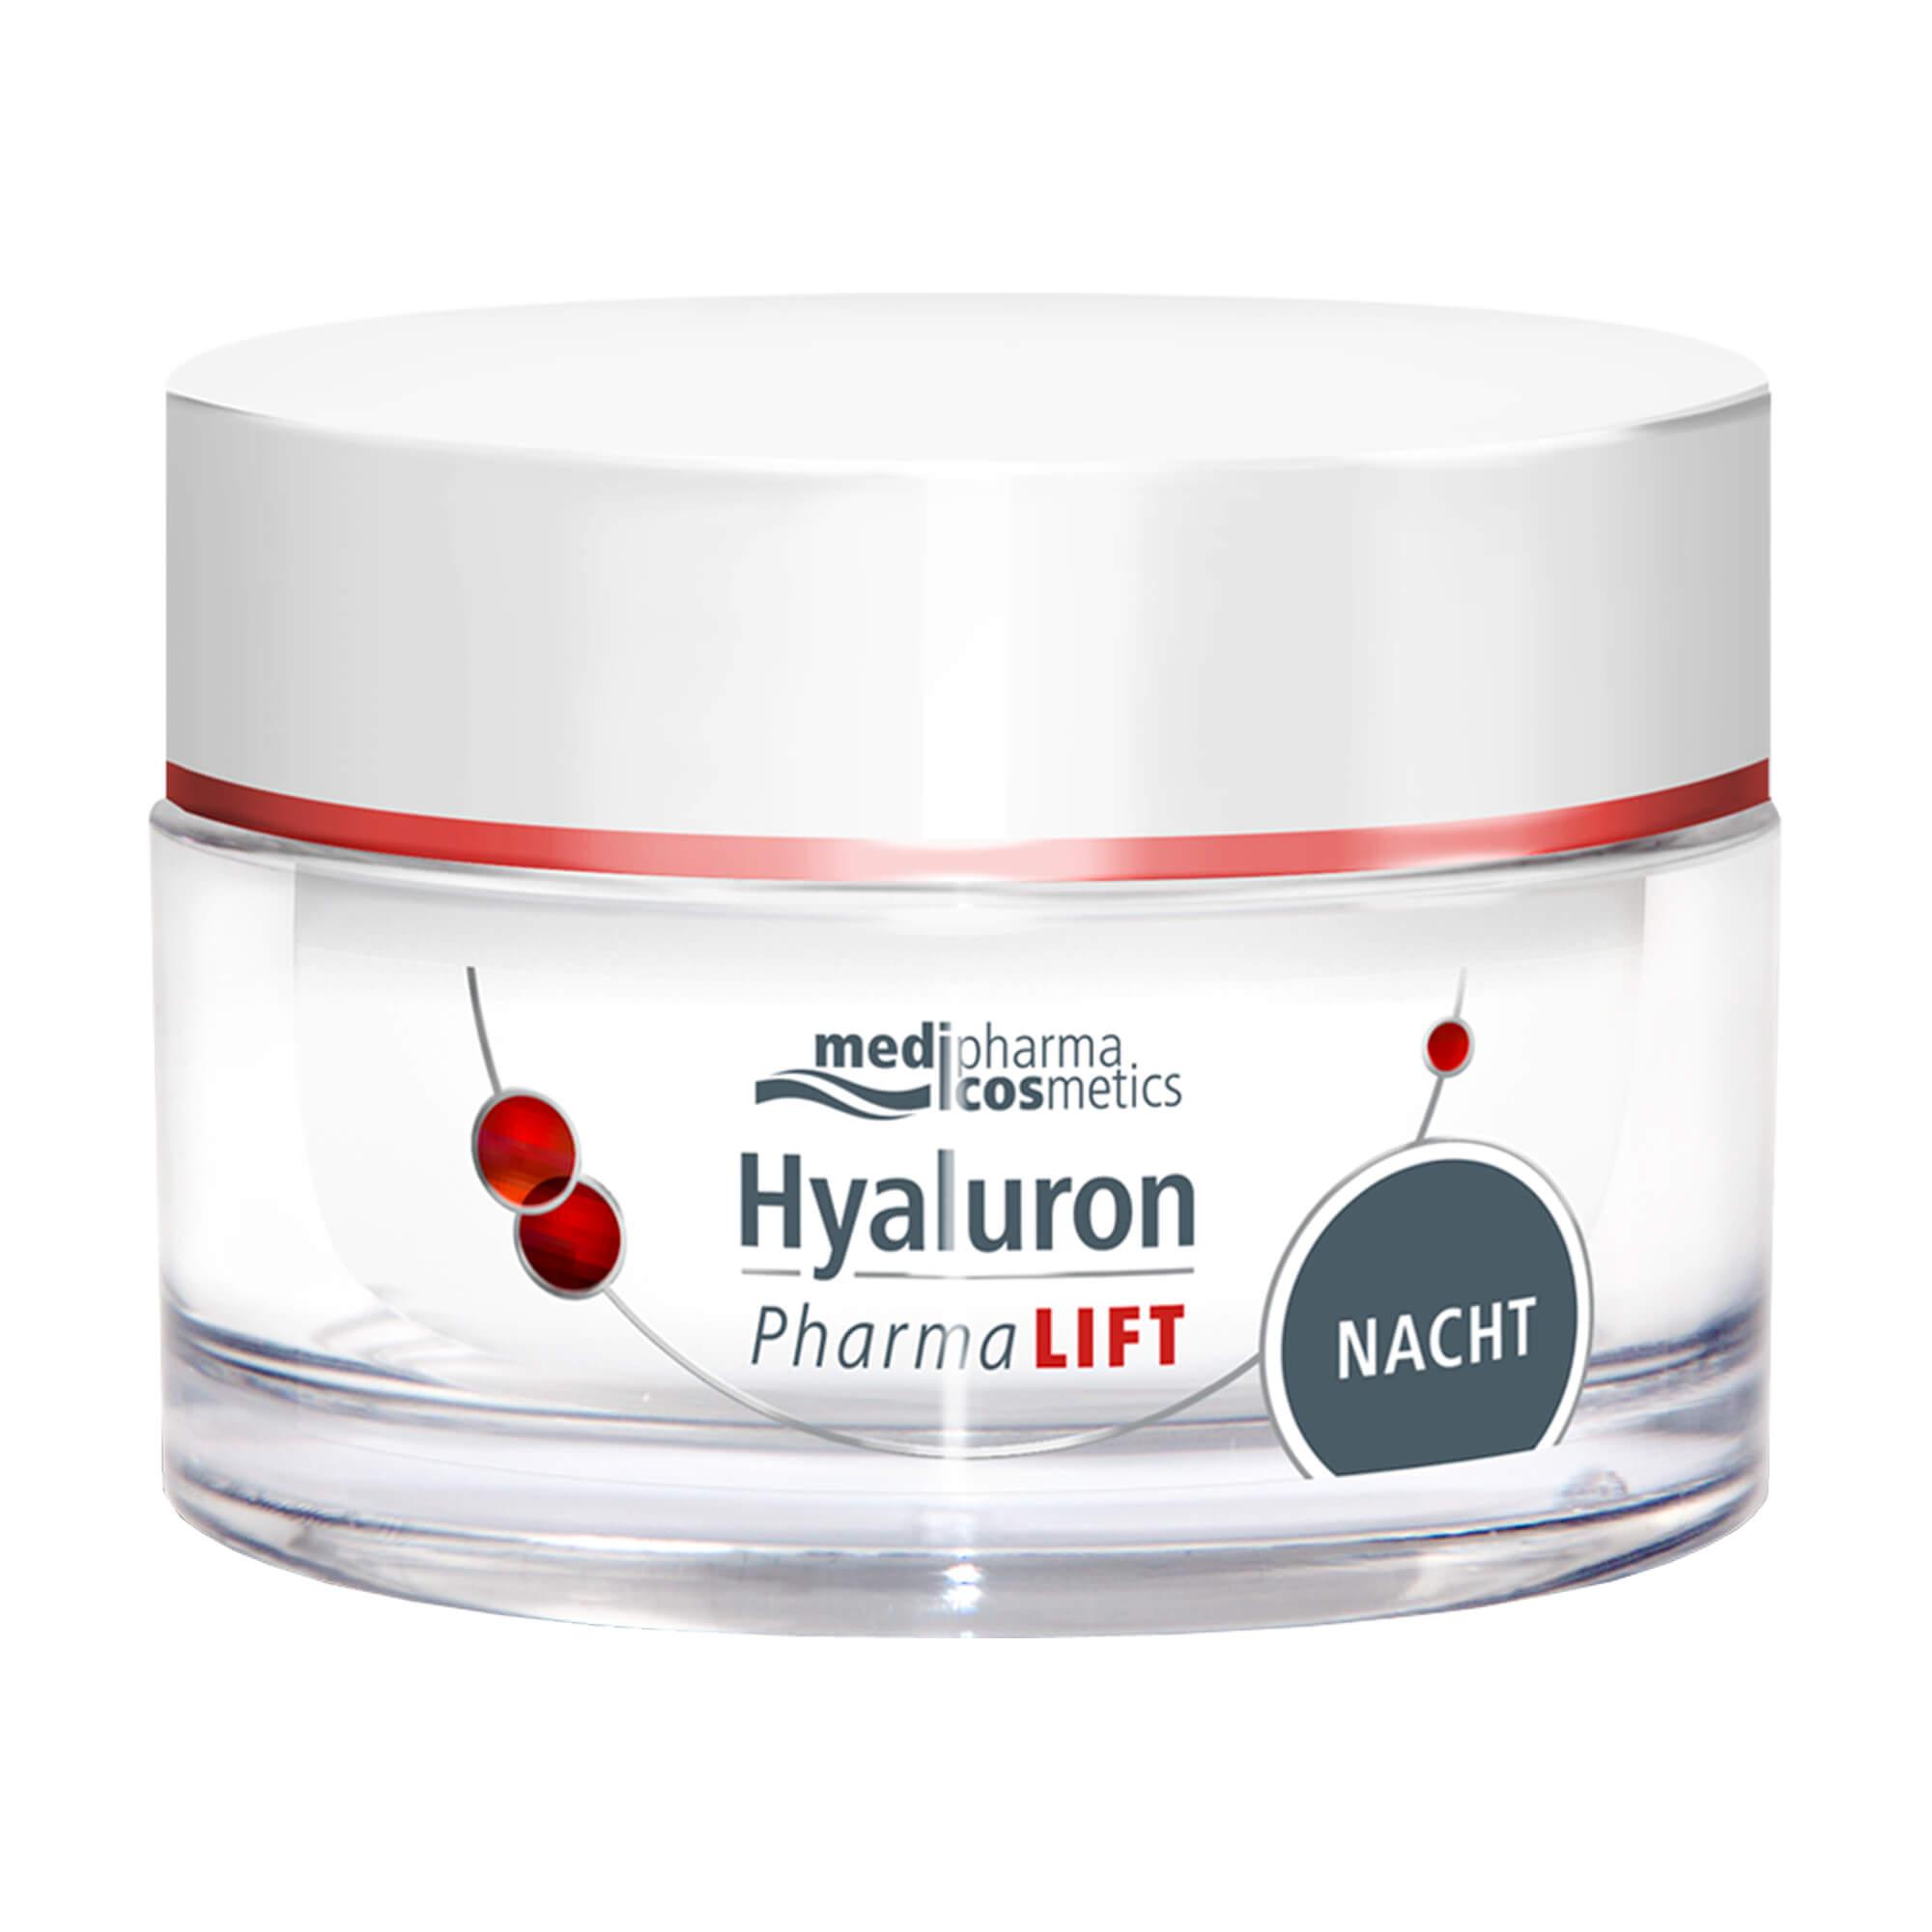 Hyaluron PharmaLIFT Nacht Creme